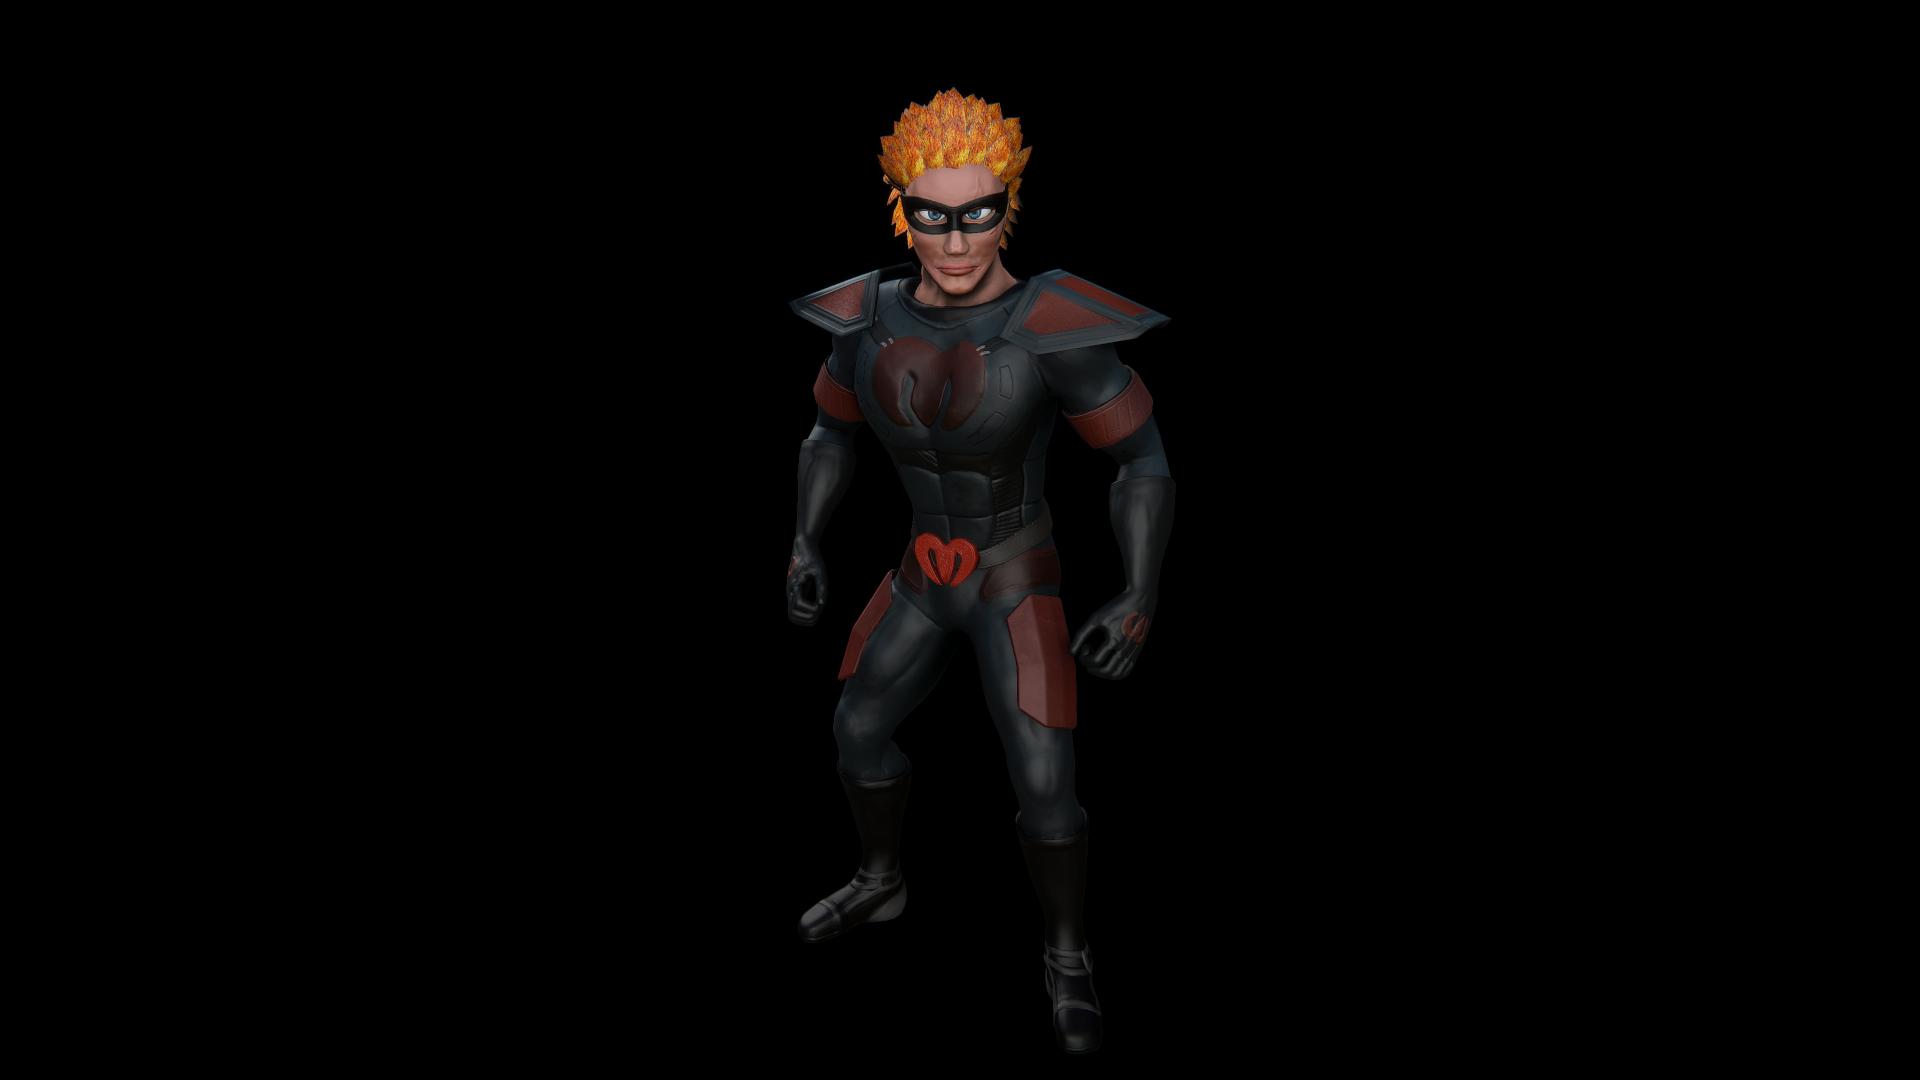 Superhero Rigged Model